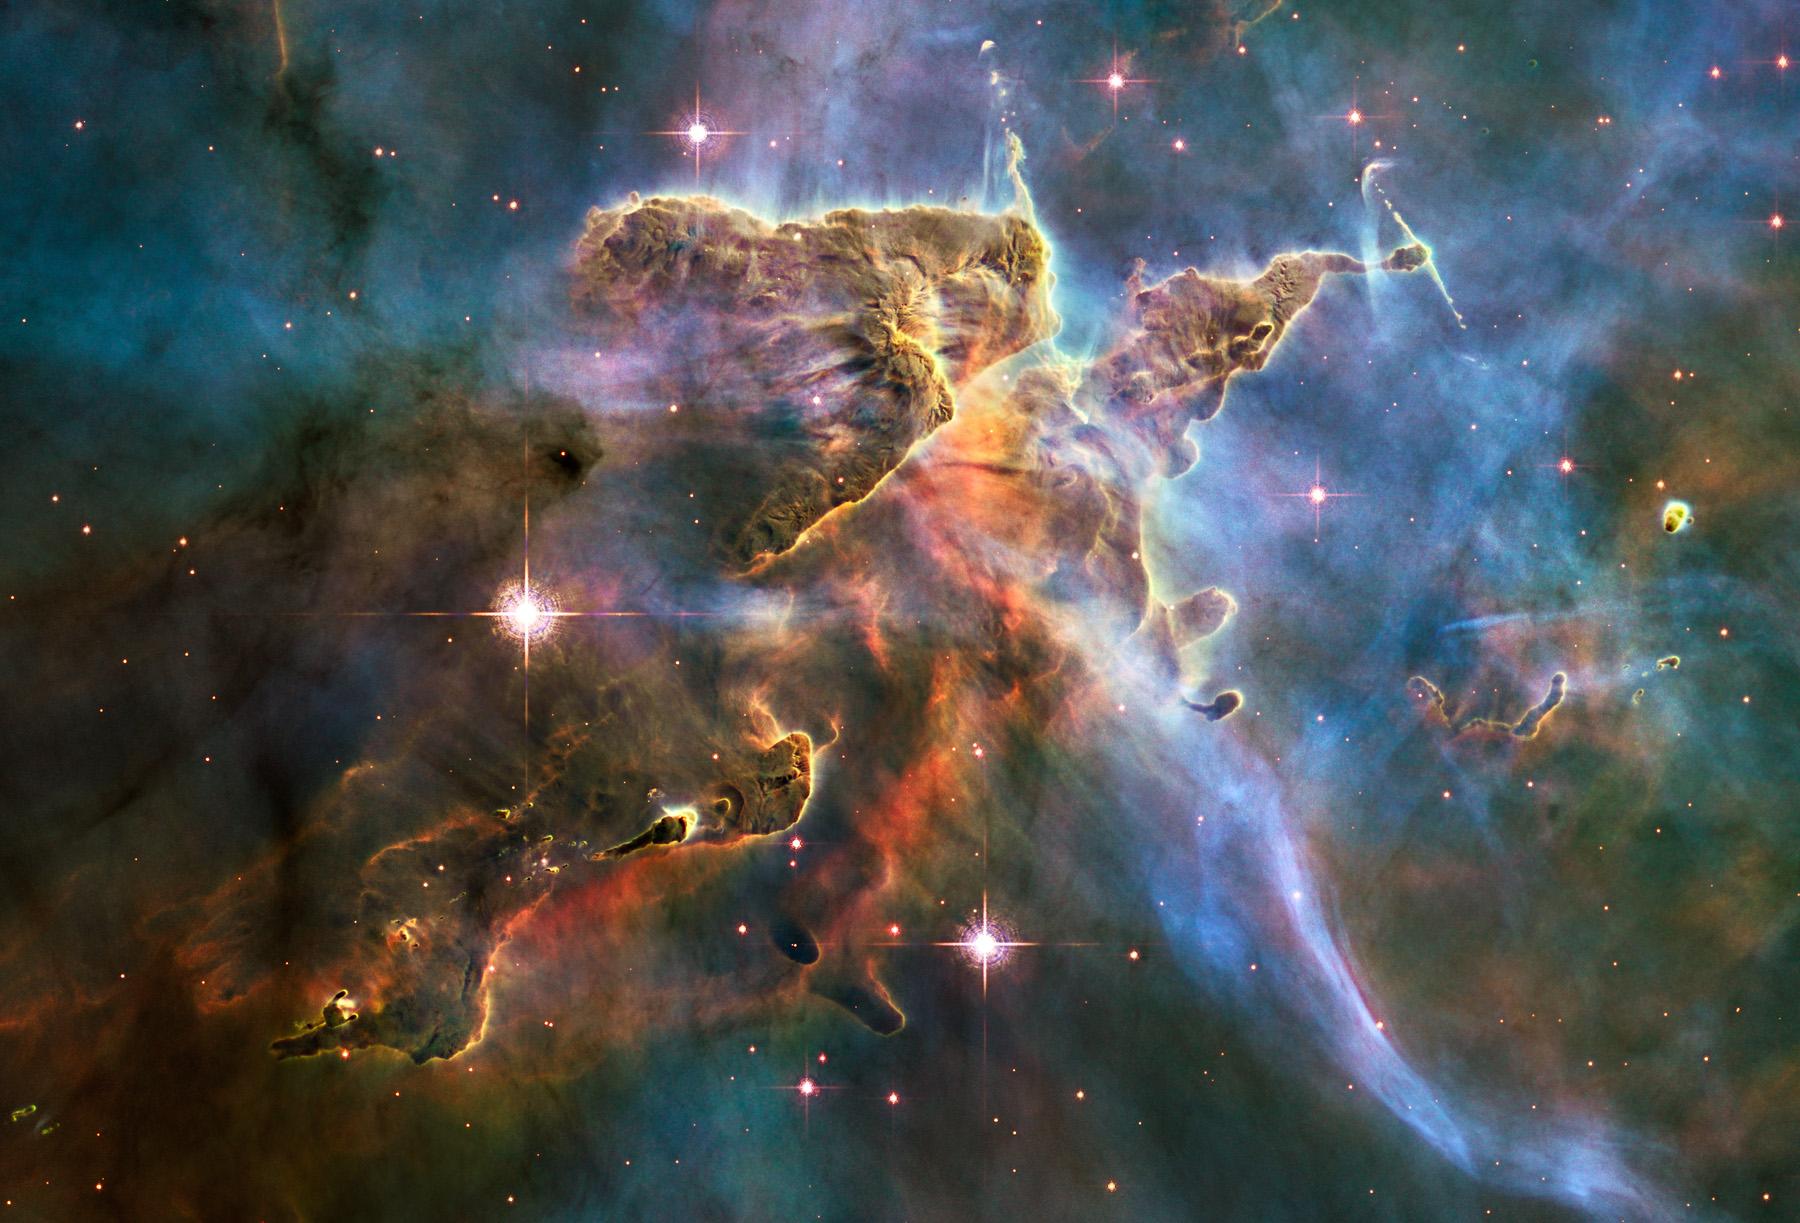 Krajobraz Mgławicy Carina/ Źródło: NASA/ESA/M. Livio, The Hubble Heritage Team & Hubble 20th Anniversary Team (STScI)